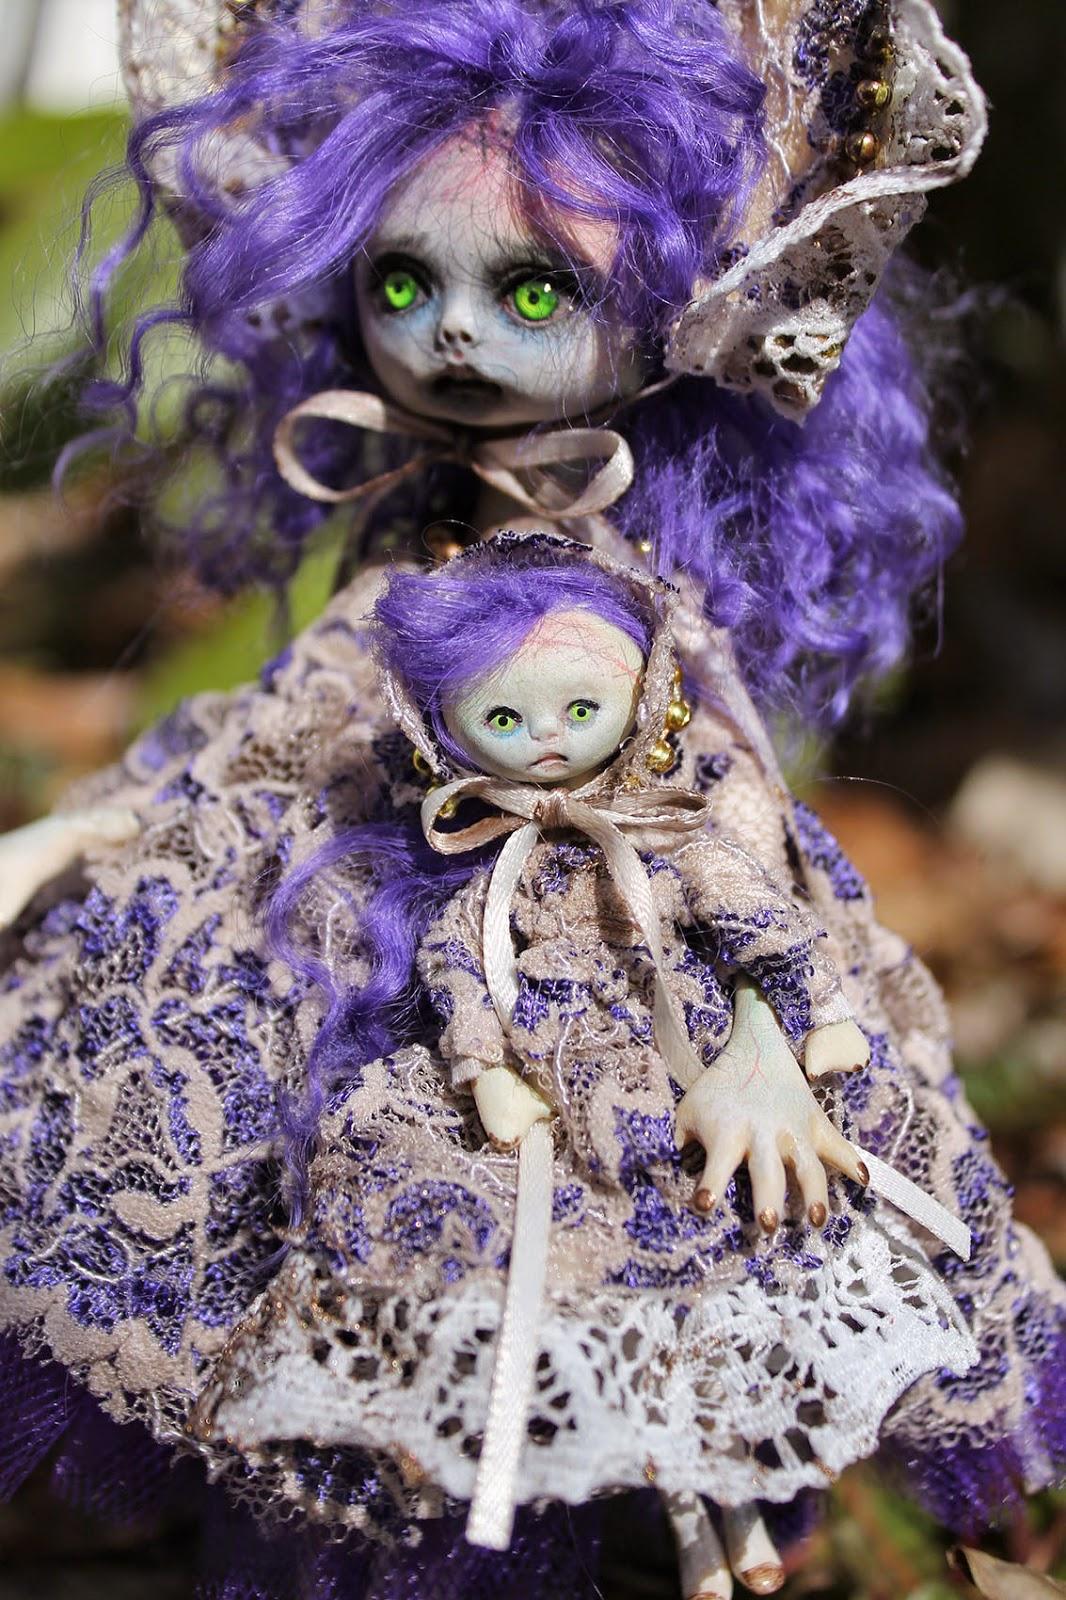 OOAK Art Doll Horror Monster Goth Fairy Tale Victorian